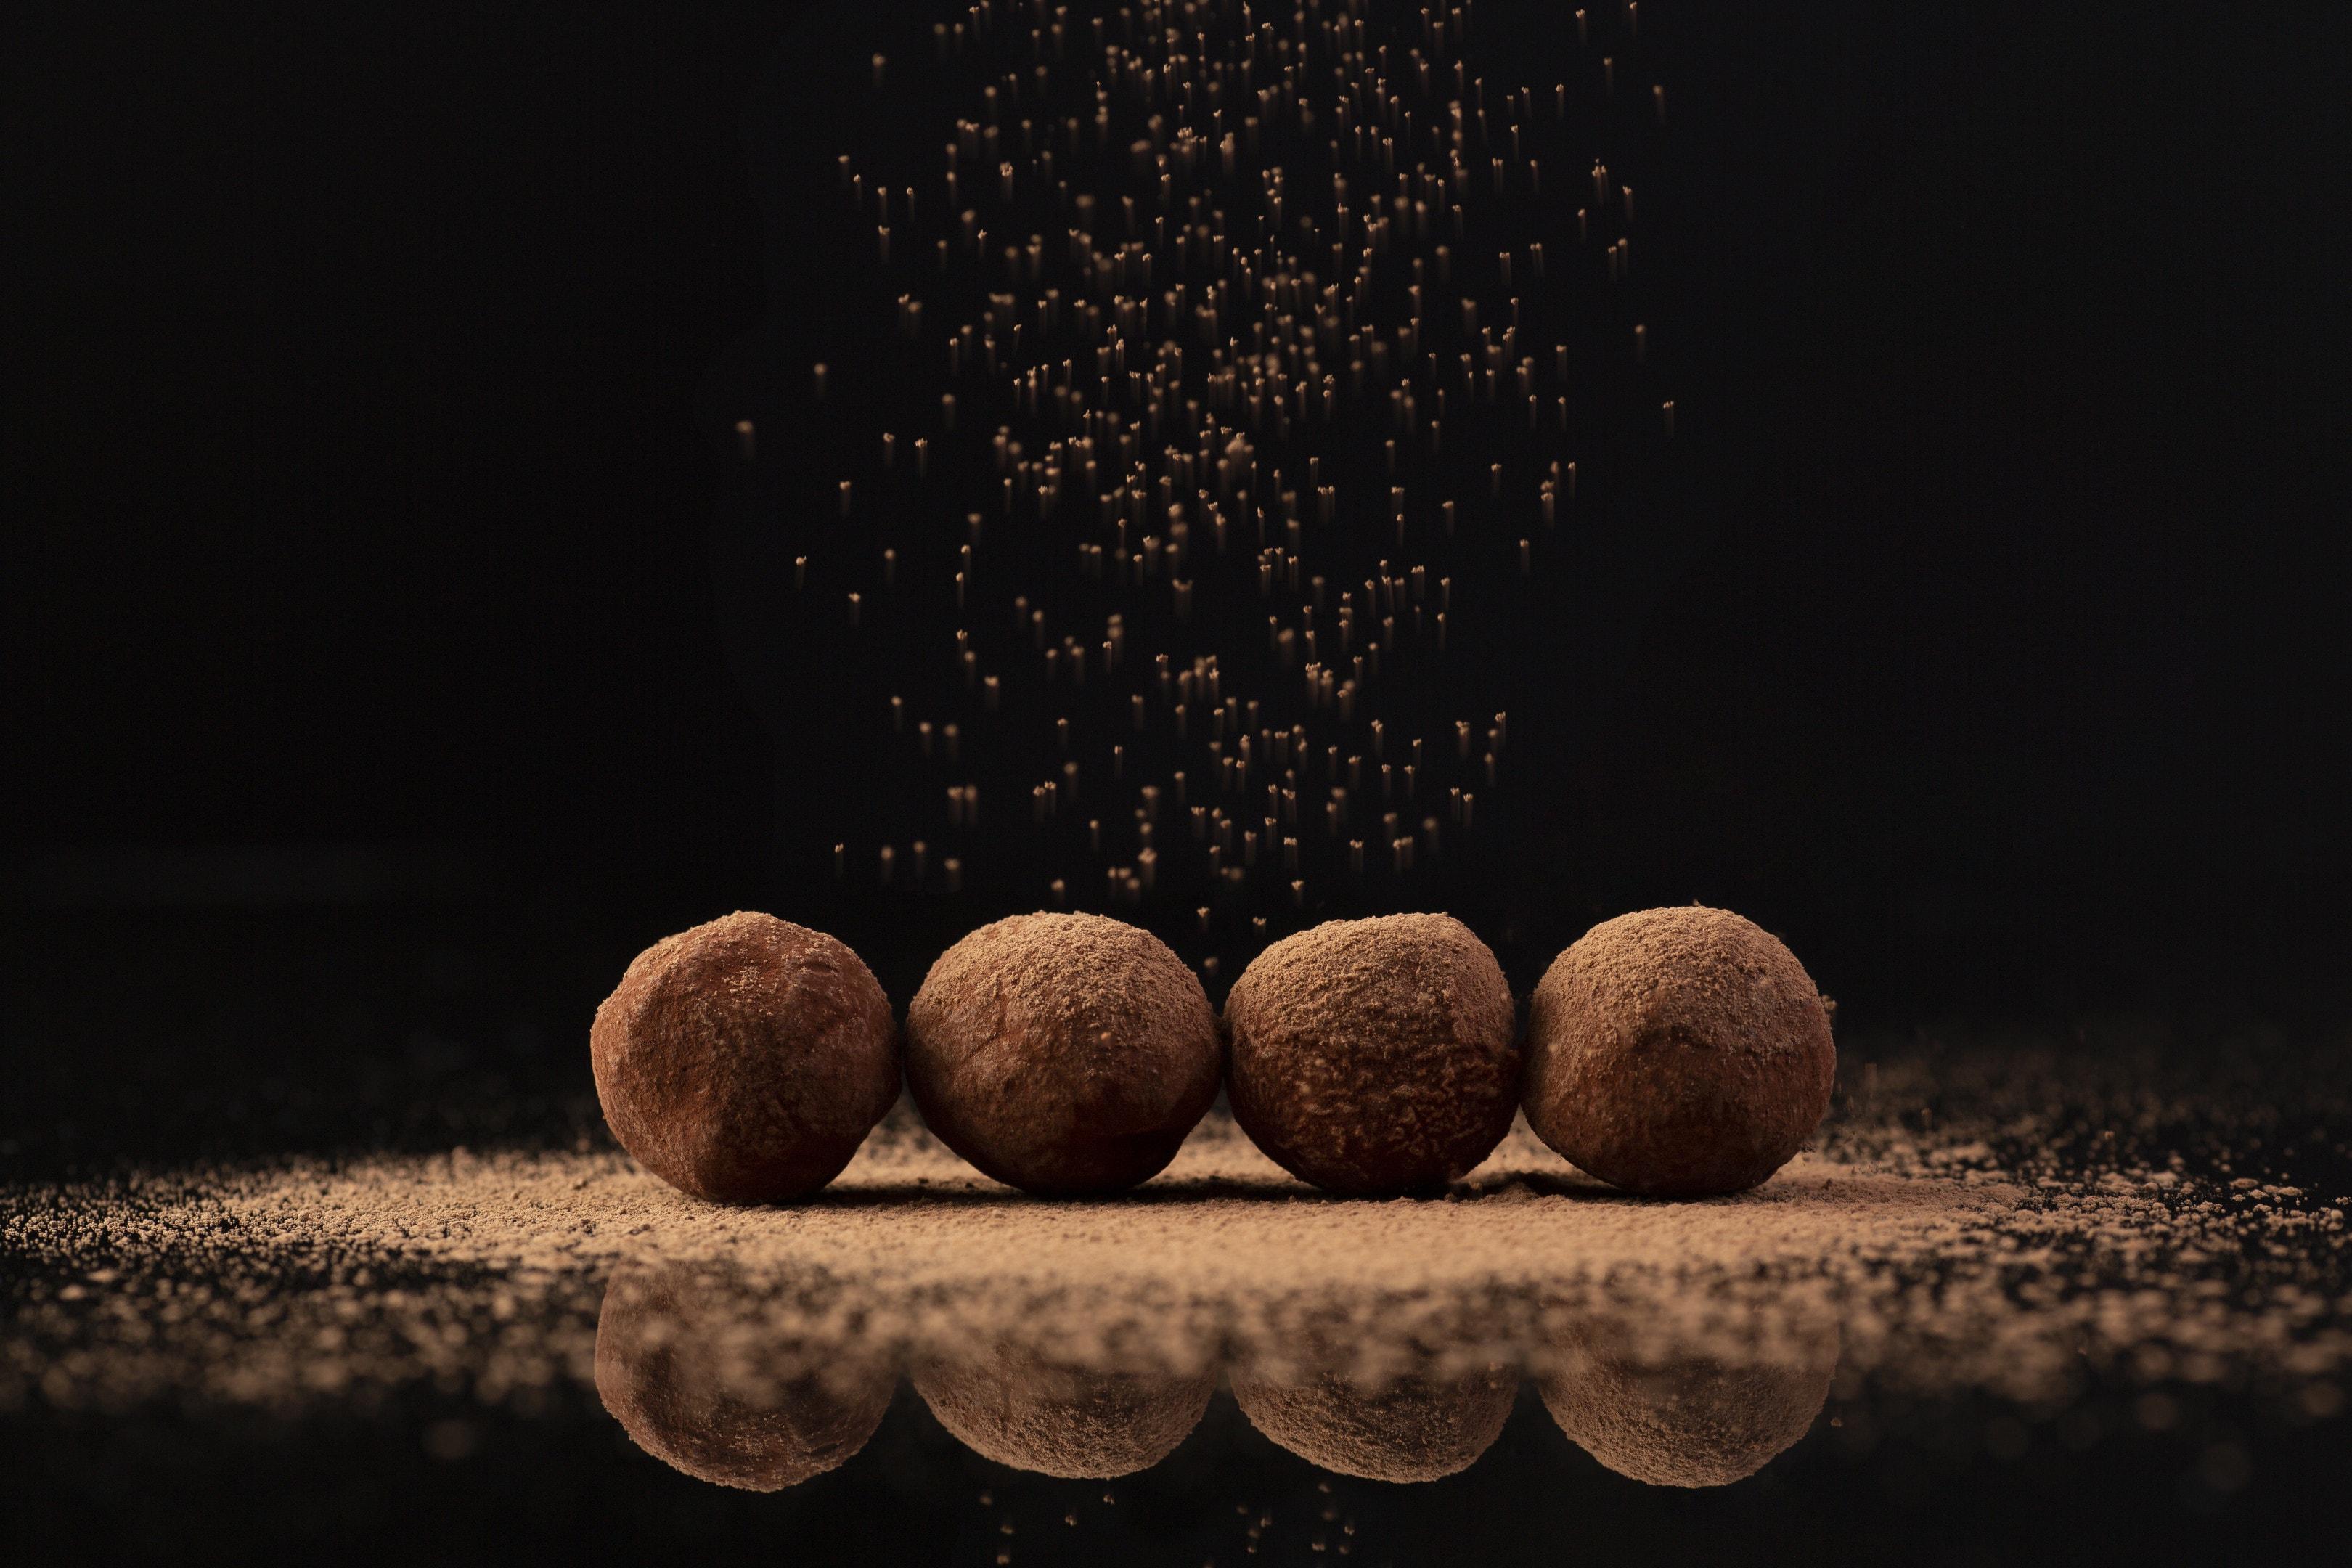 Cocoa sprinkled truffles